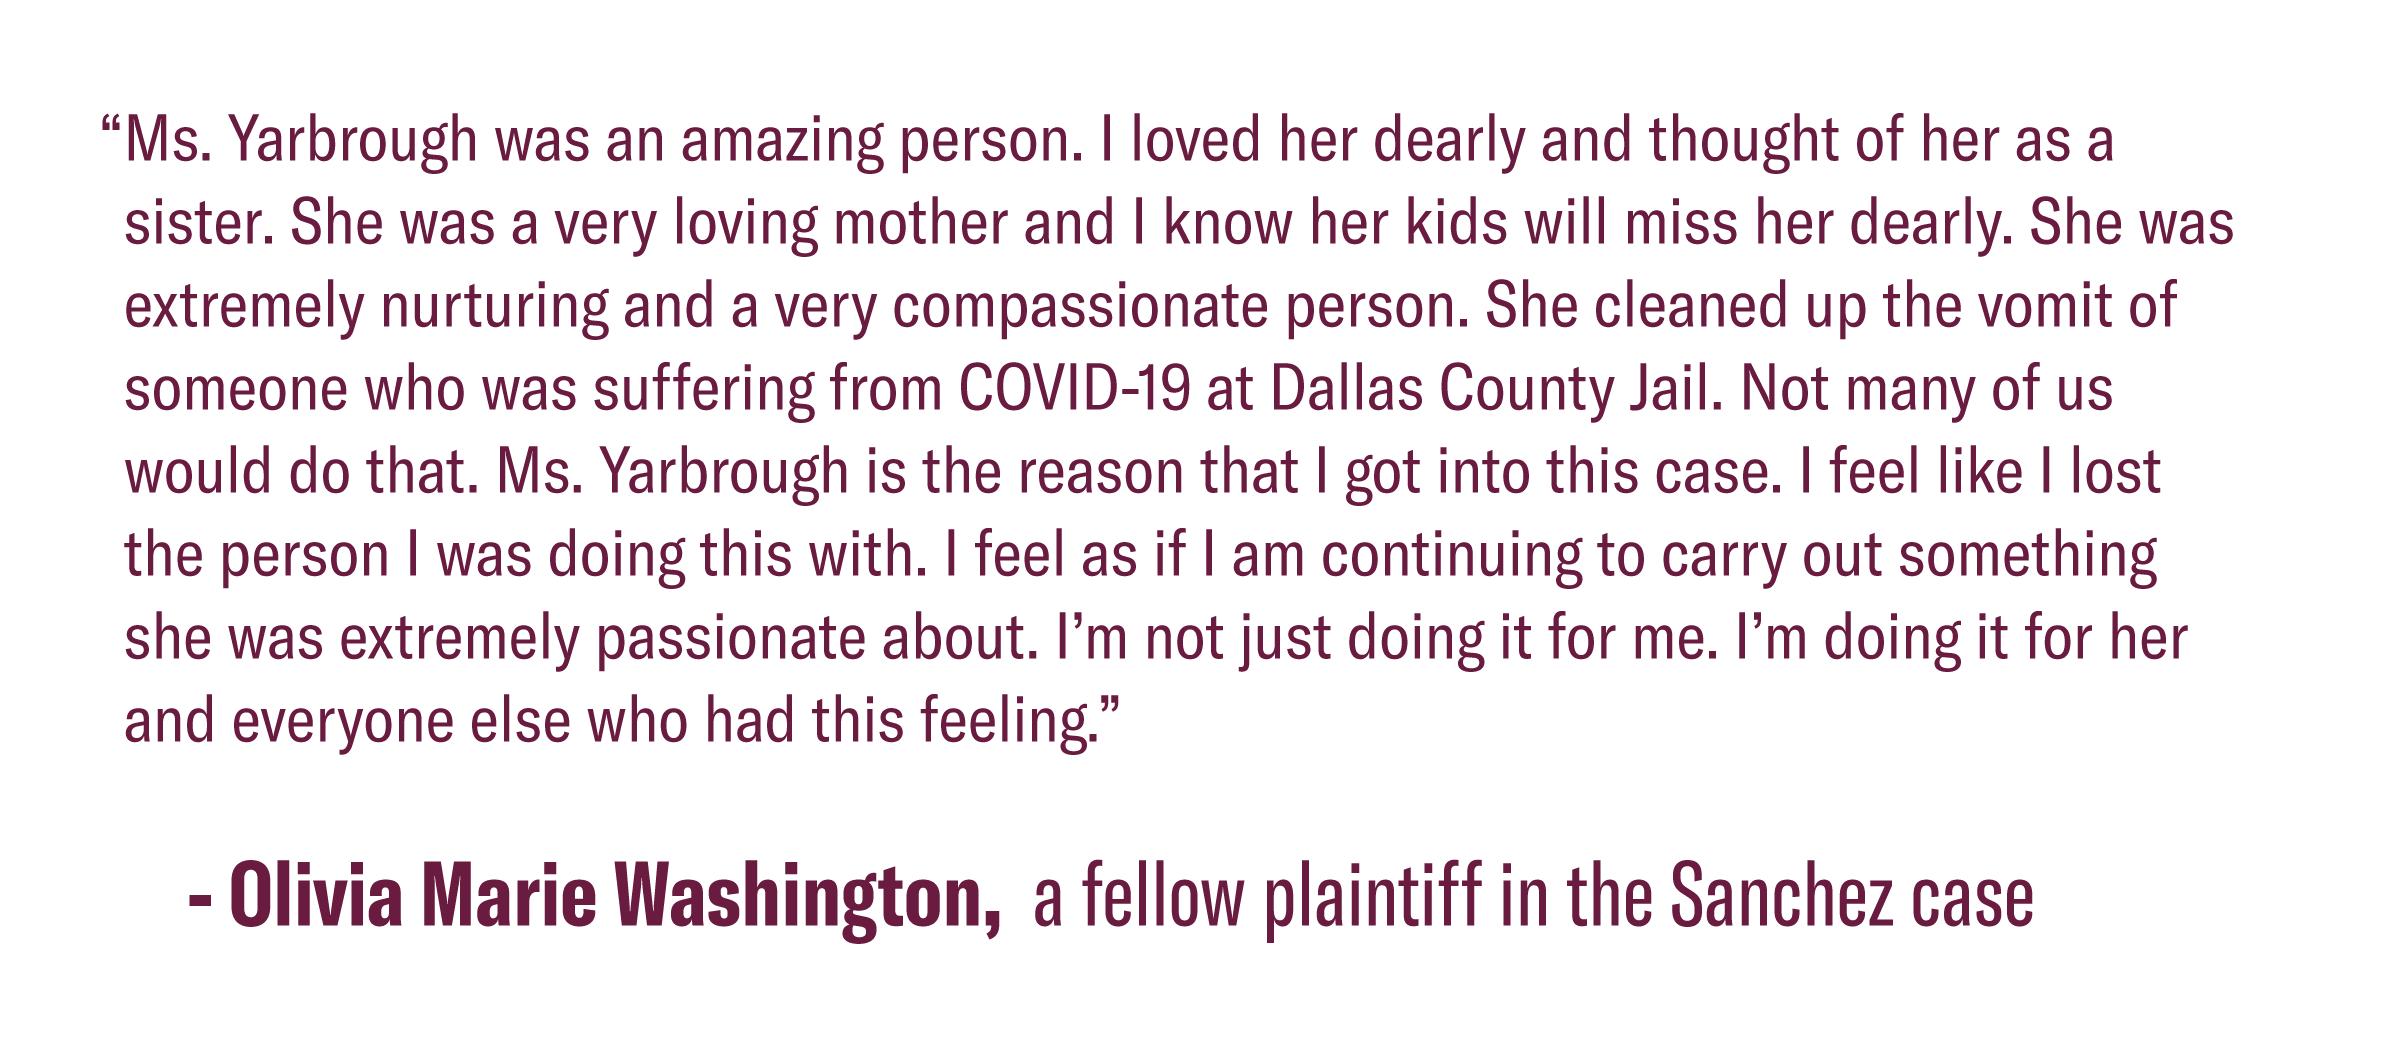 Quote from Olivia Washington Kiara's friend